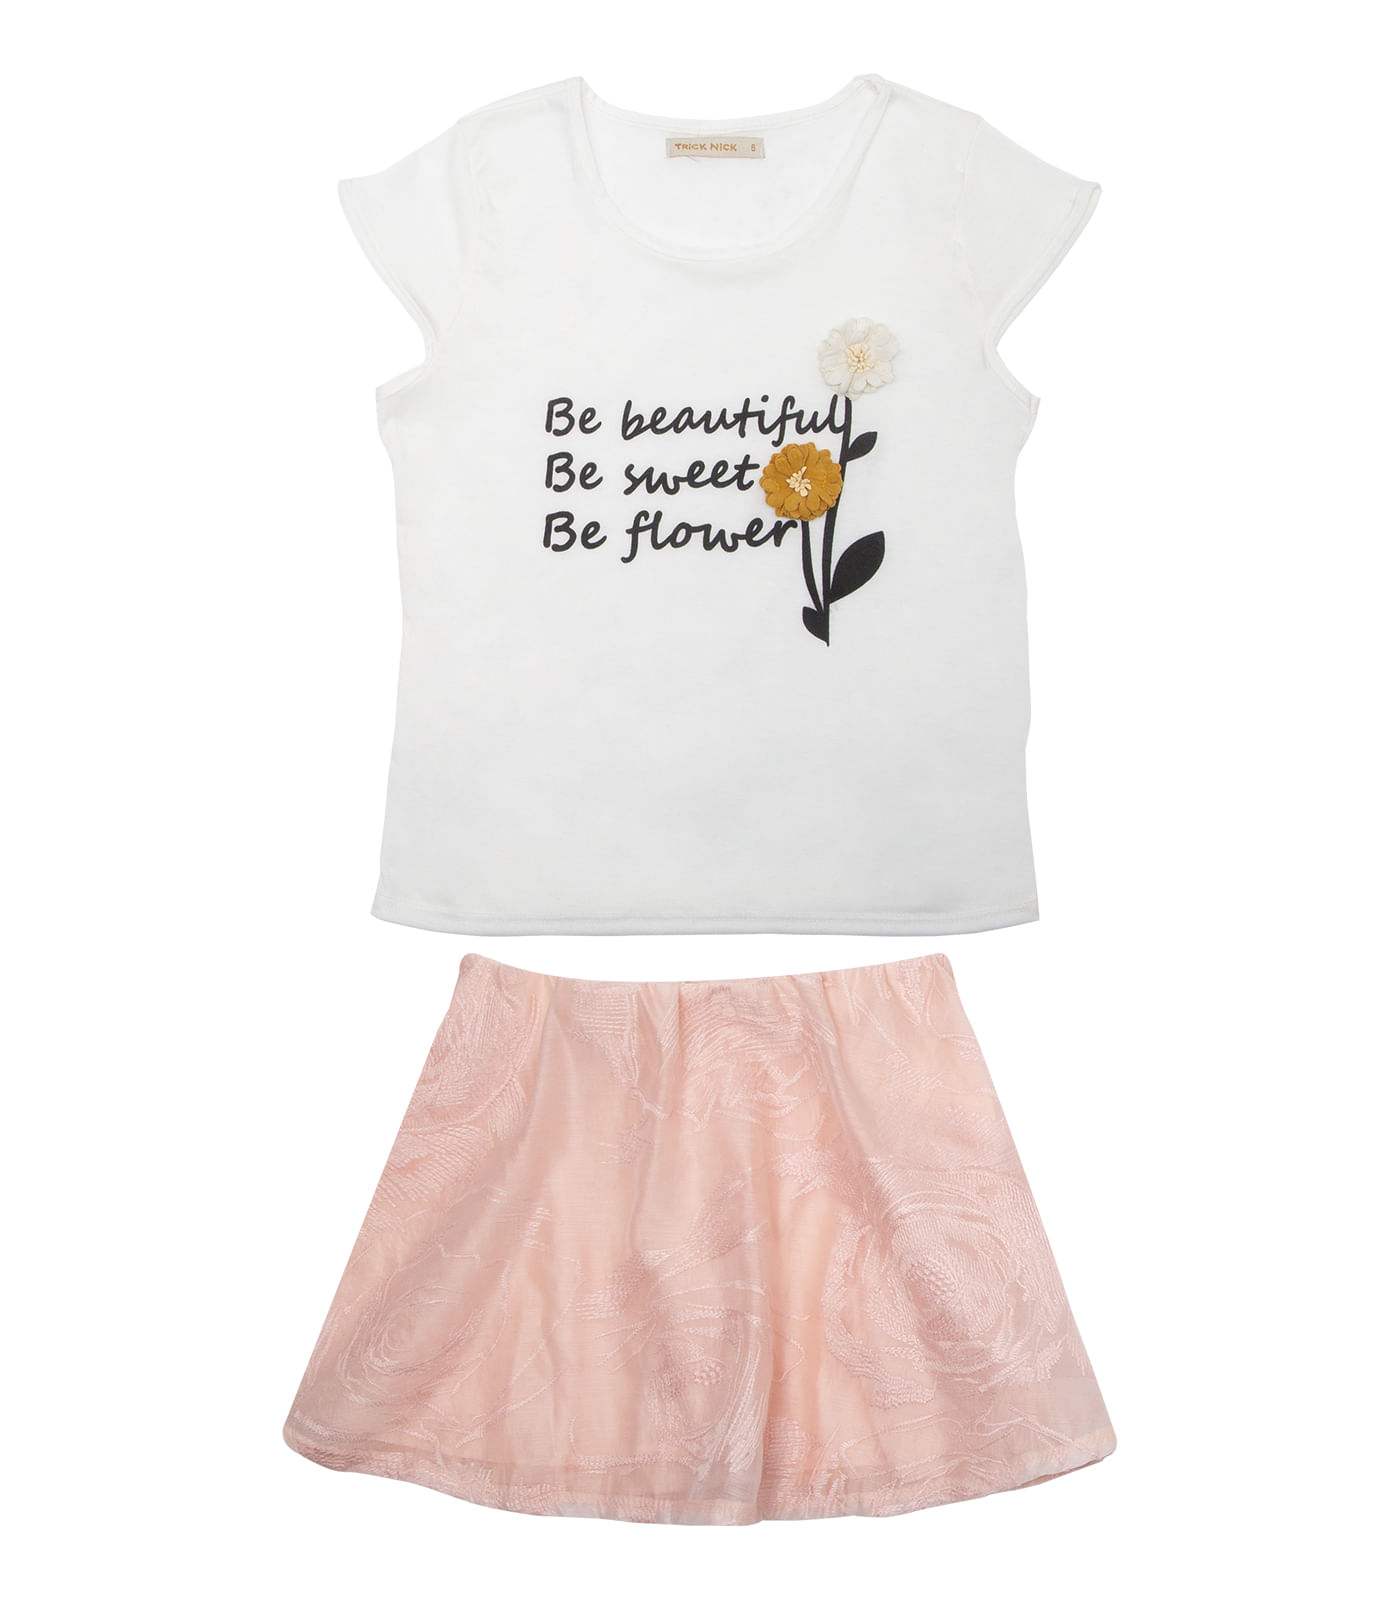 Conjunto-Infantil-Feminino-Be-Beautiful-Trick-Nick-Bege